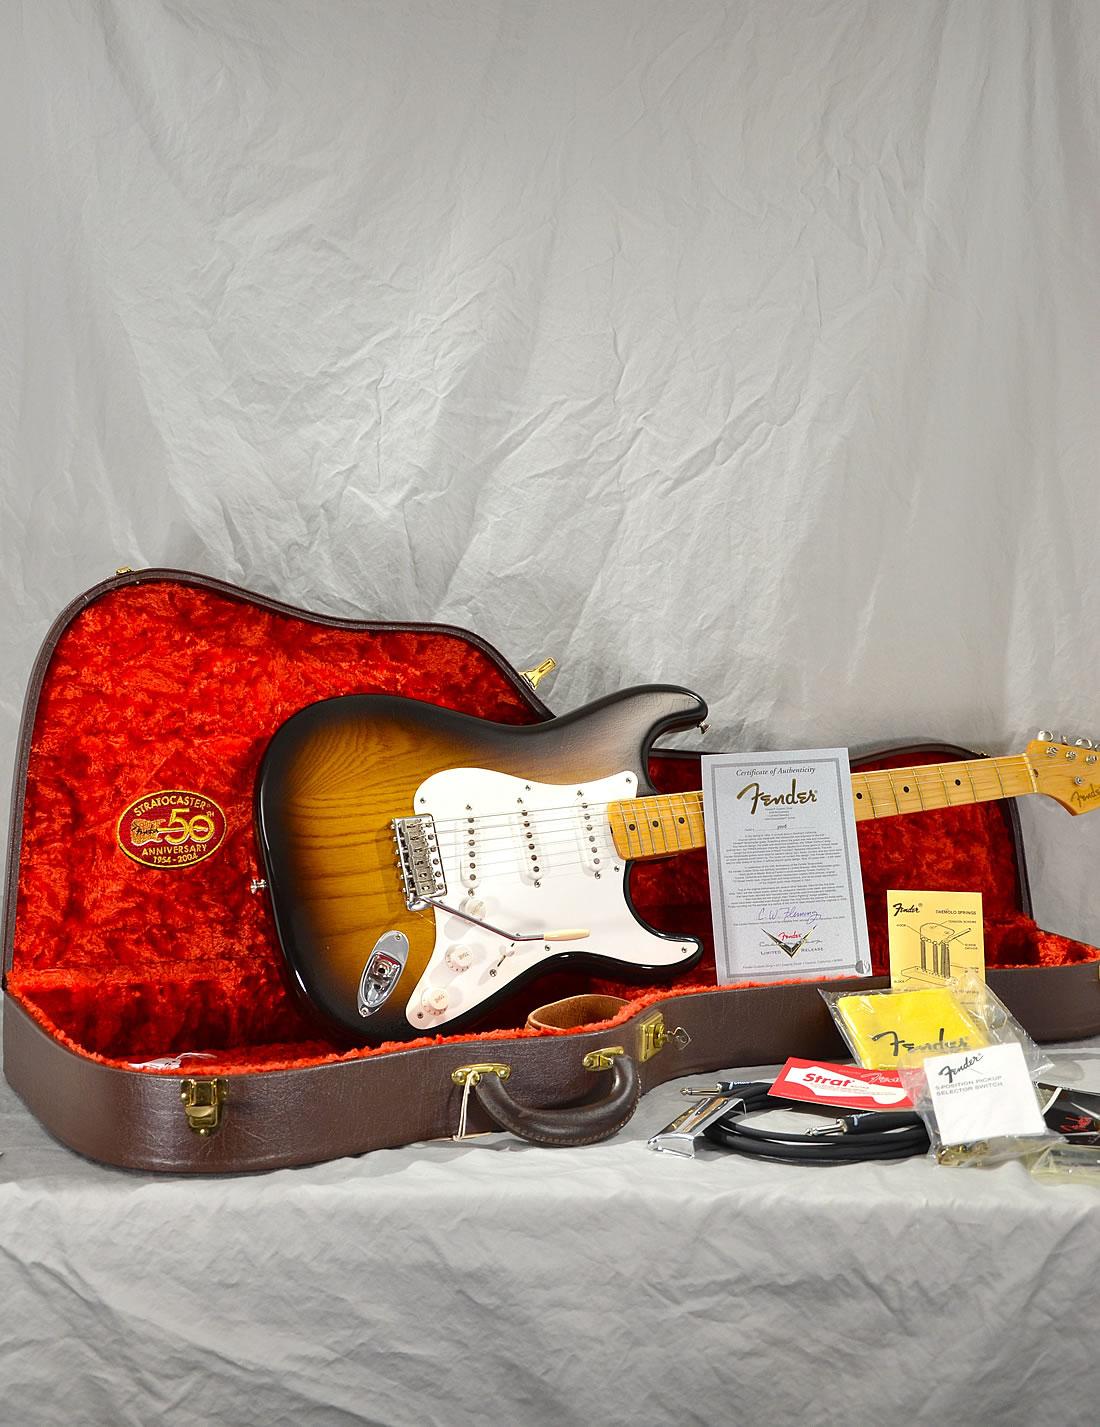 1954 fender stratocaster limited edition reissue 1 vintage guitars and amps. Black Bedroom Furniture Sets. Home Design Ideas